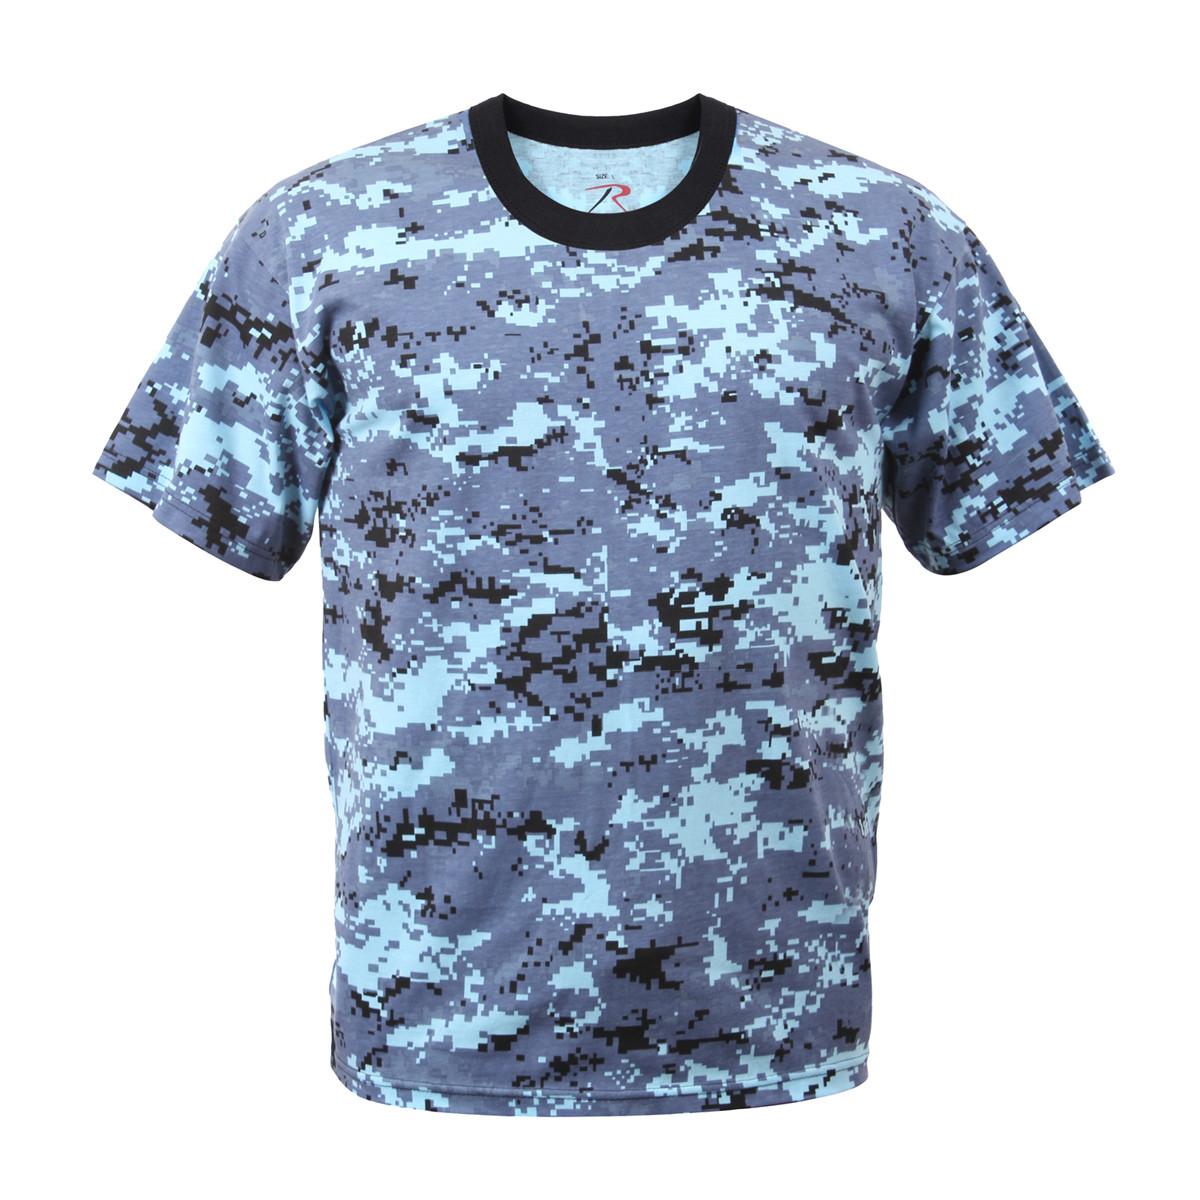 00d6b683 Shop Sky Blue Digital Camo T Shirts - Fatigues Army Navy